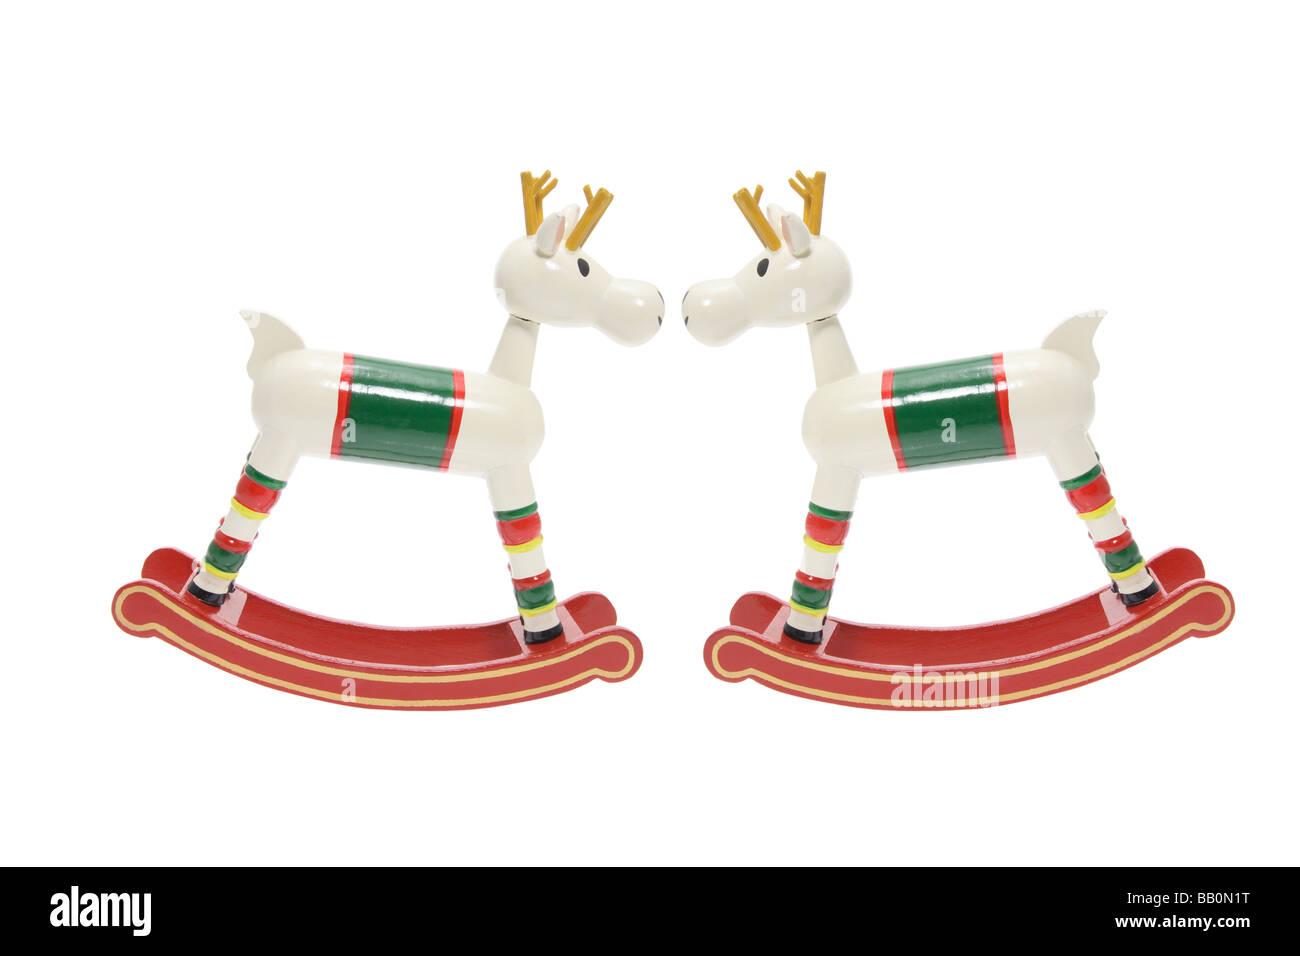 Wooden Rocking Horses Stock Photo